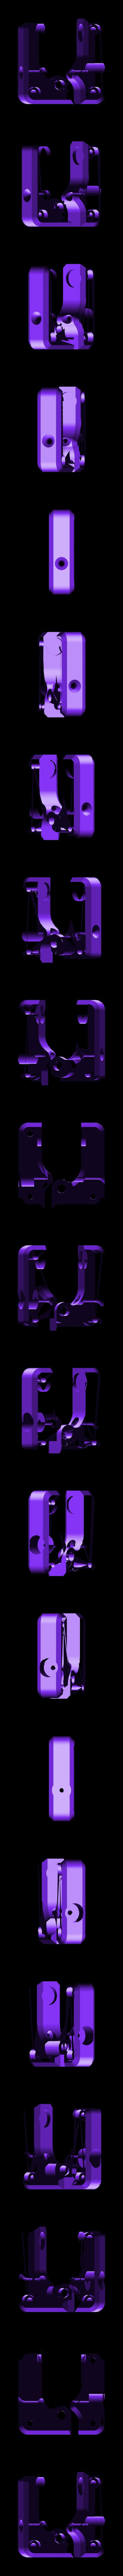 Neutron_Plunger_set.stl Download free STL file Neutron - Open Source 3D Printer • 3D printable object, ATOM3dp